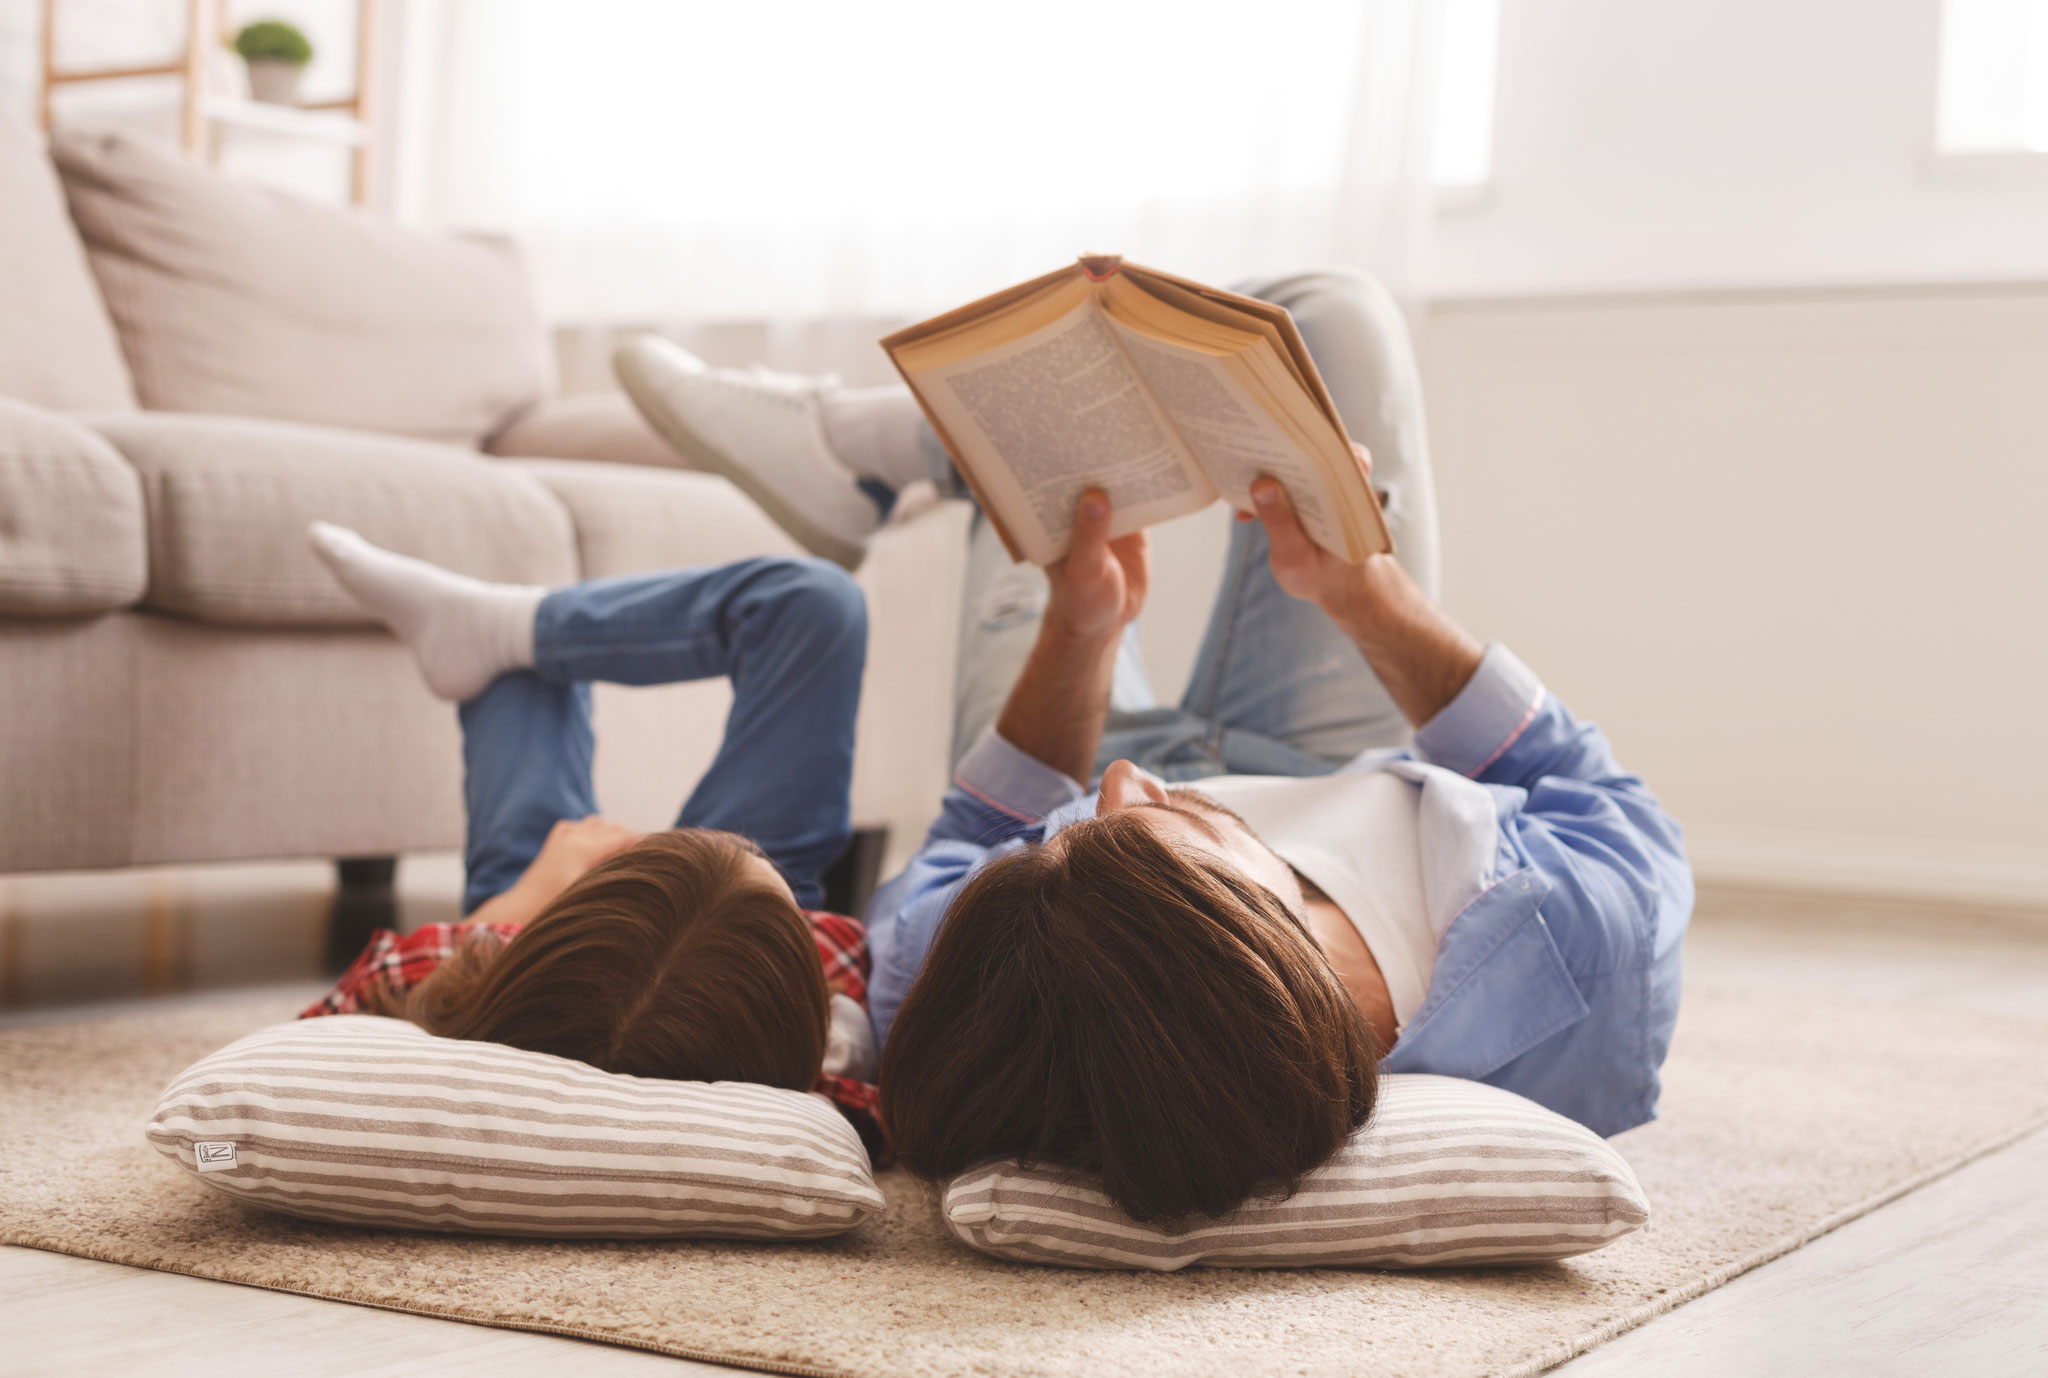 Bücher lesen © Prostock-studio, Adobe Stock